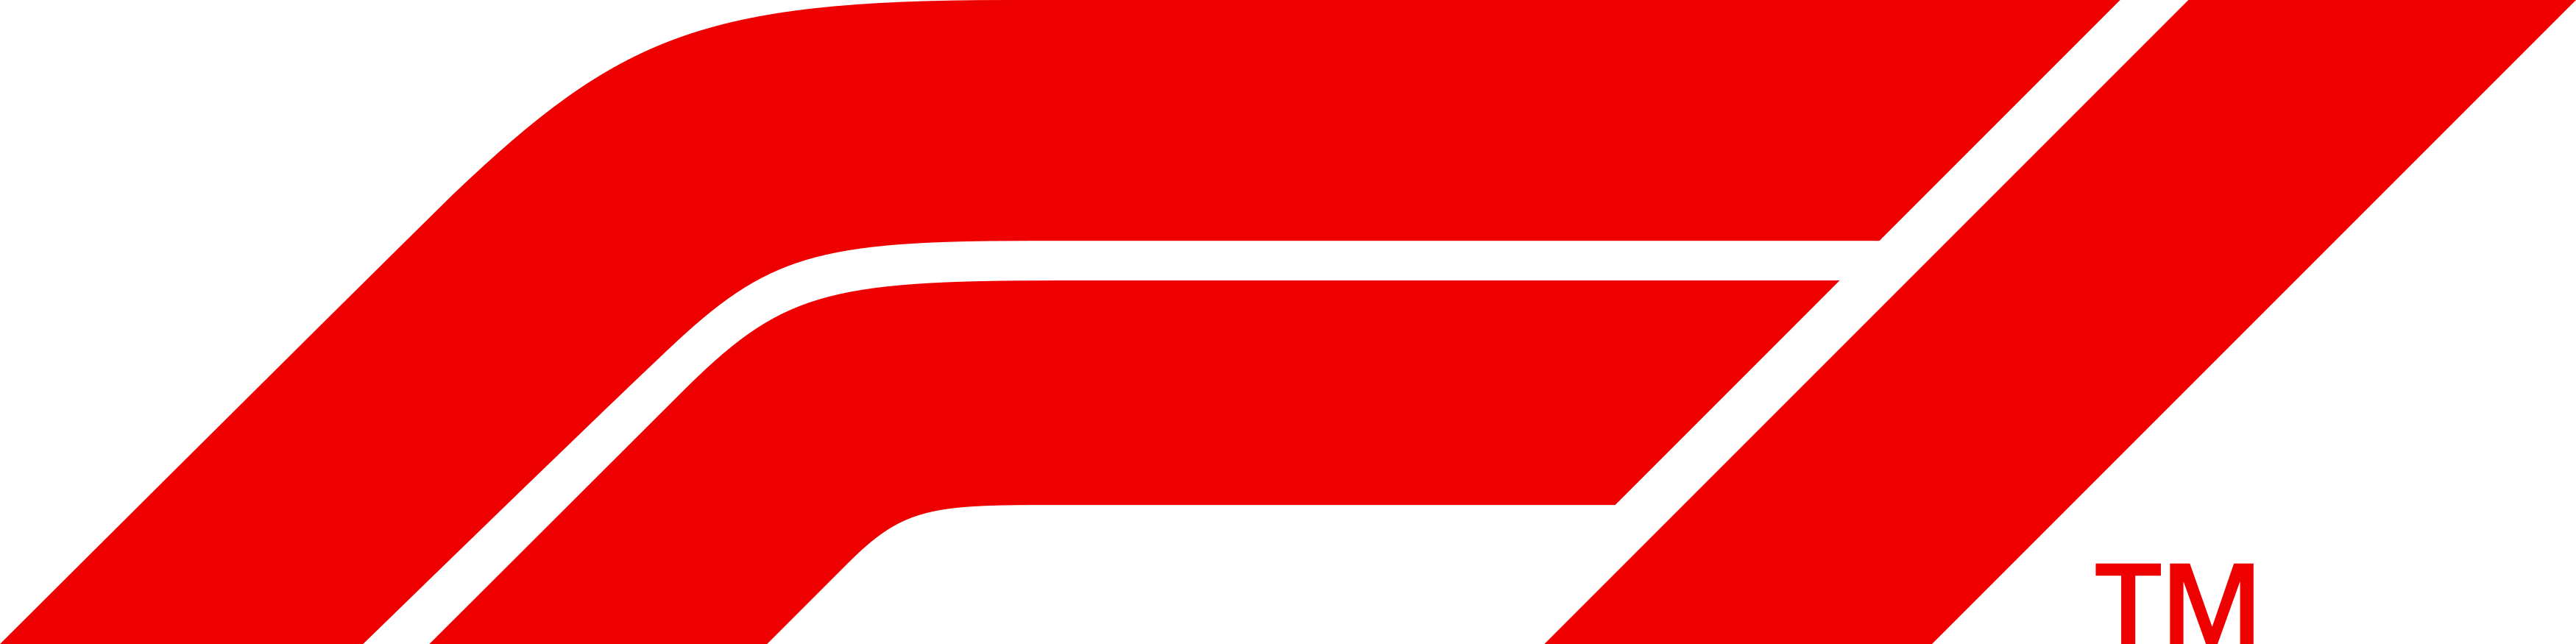 formula 1 logo 7 - Formula 1 Logo - F1 Logo